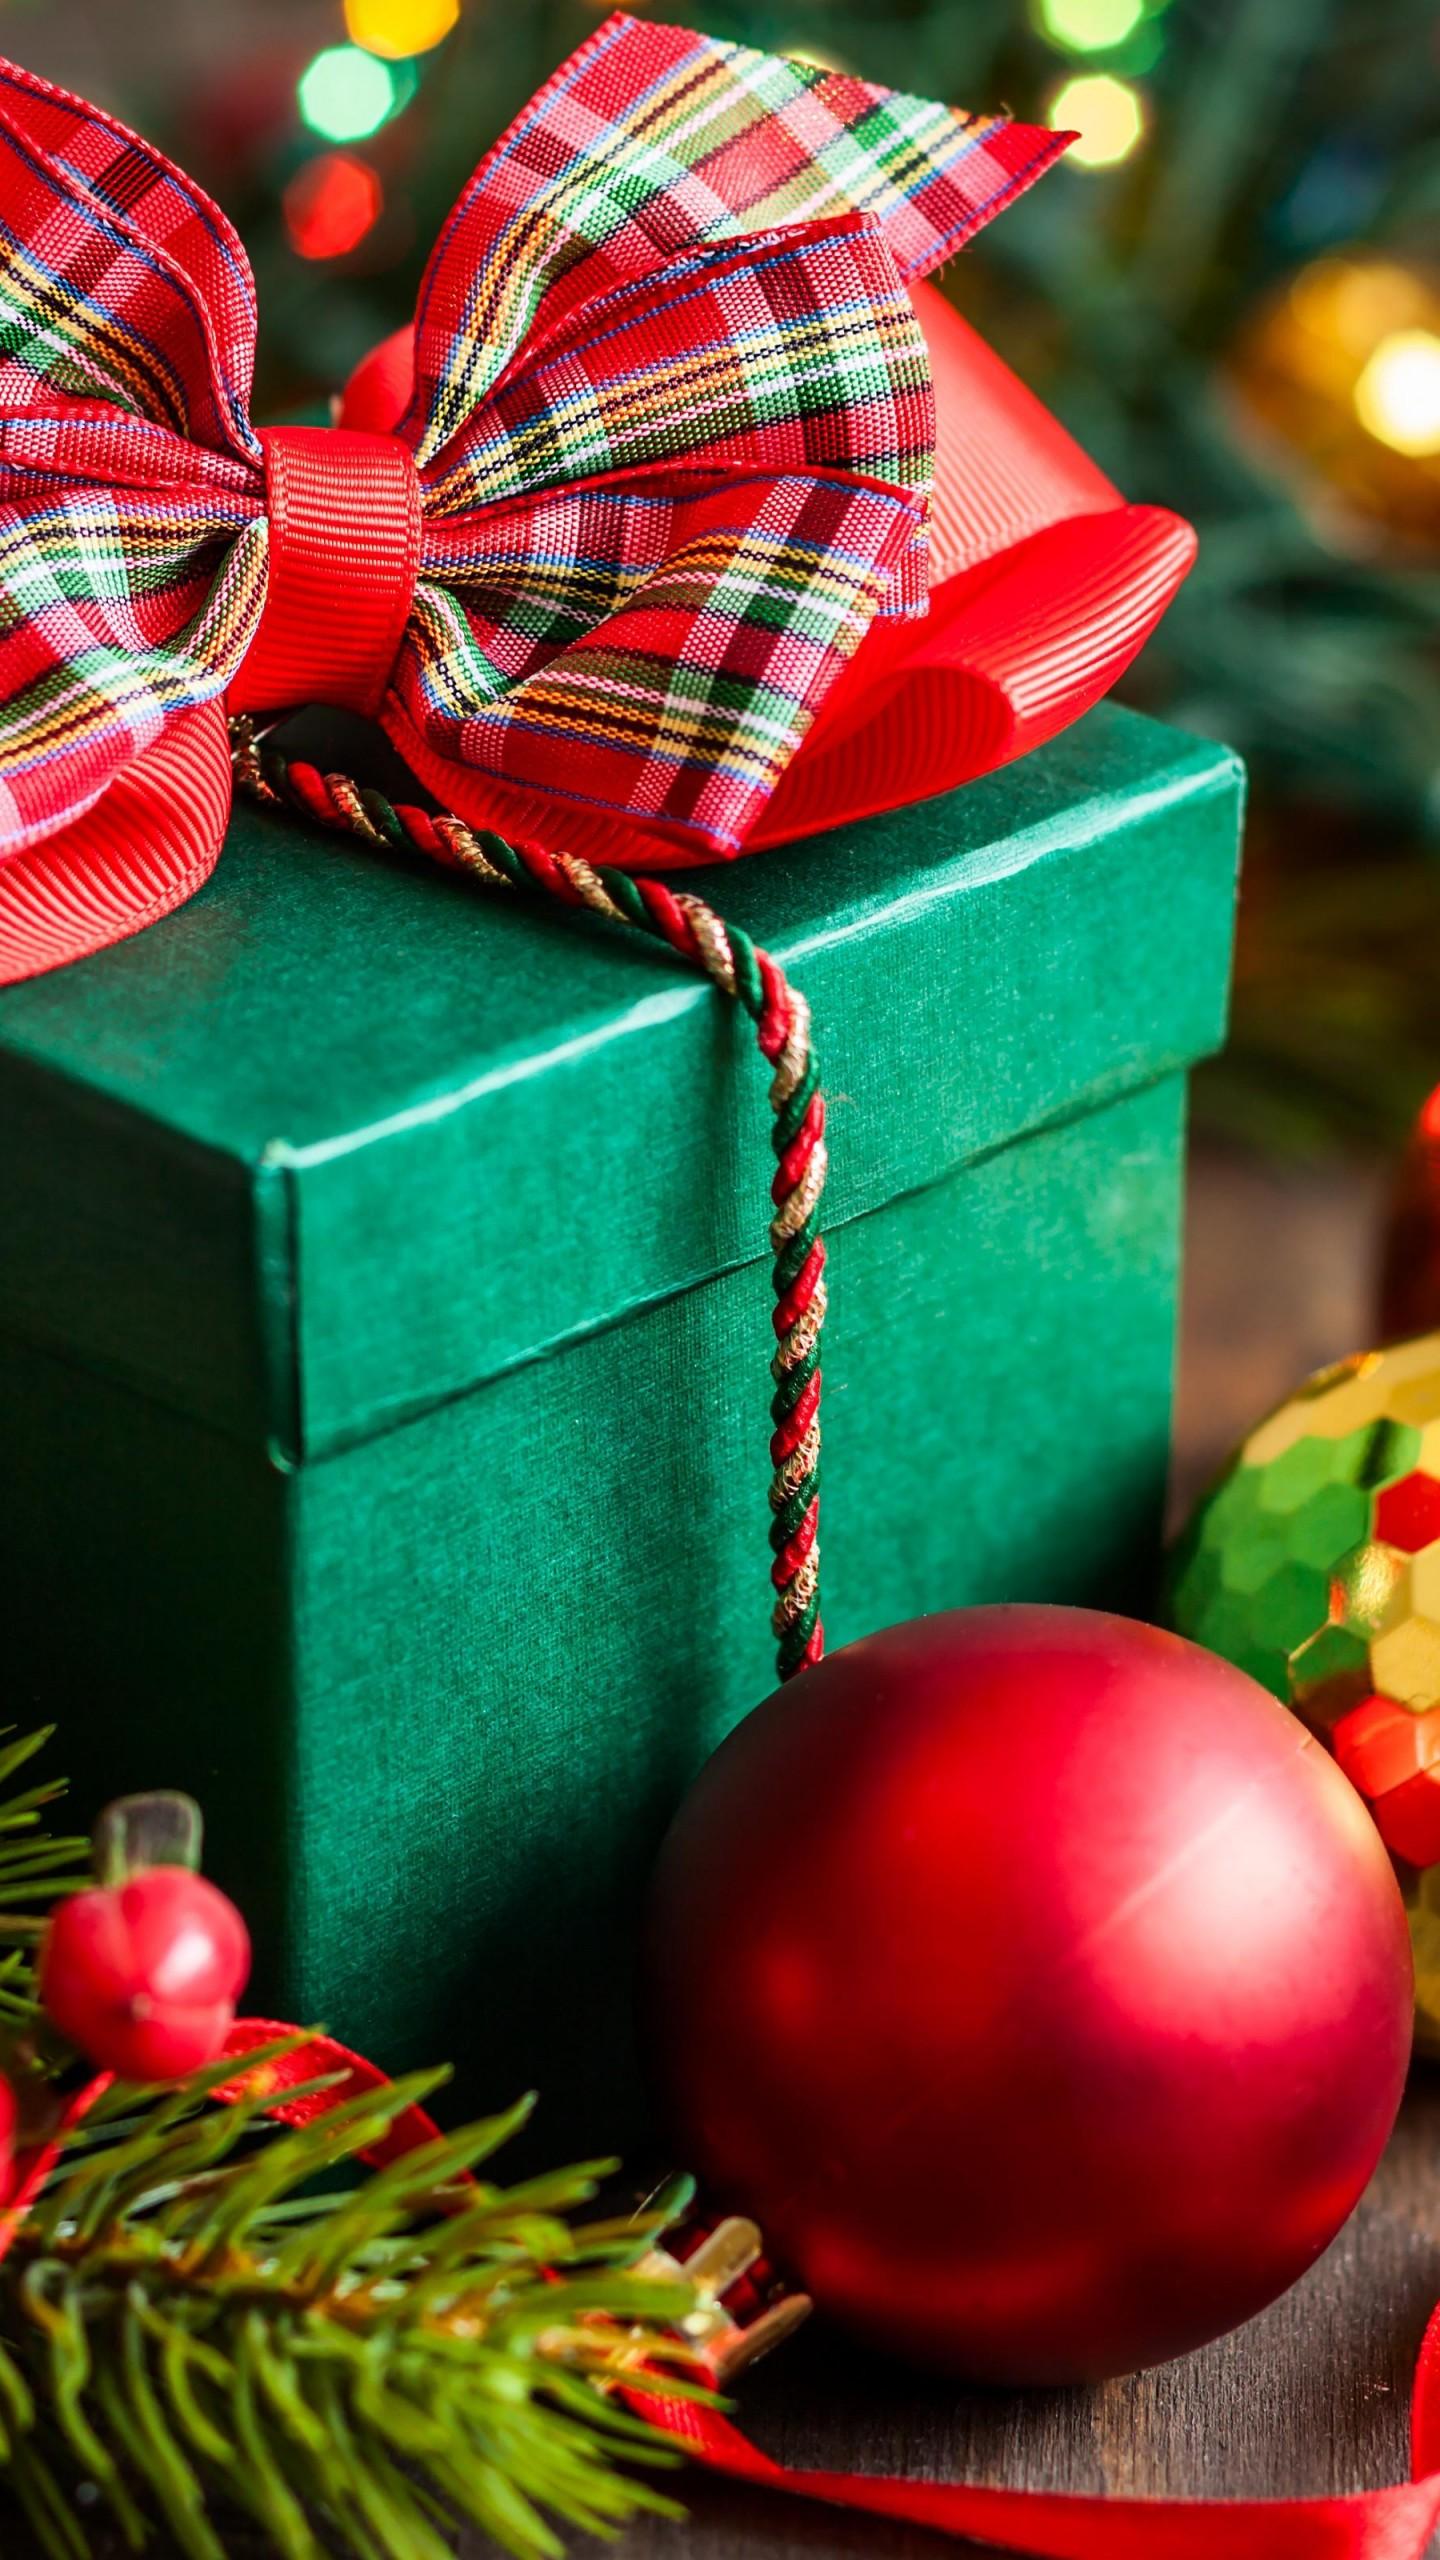 Wallpaper Christmas New Year Gift Box Balls Fir Tree